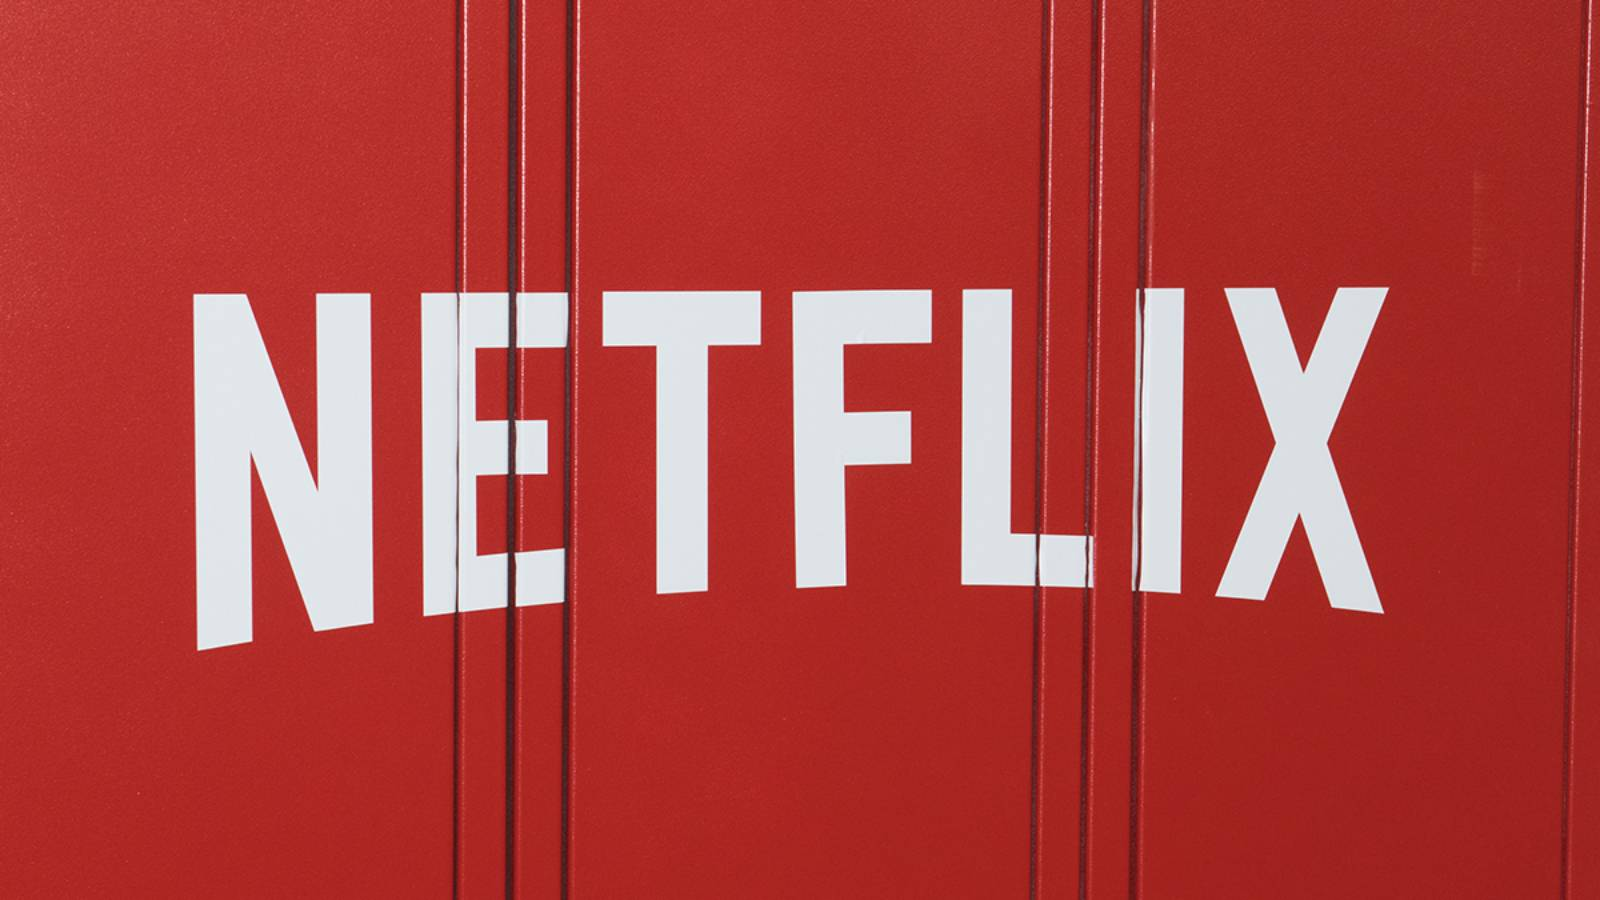 Netflix transfer